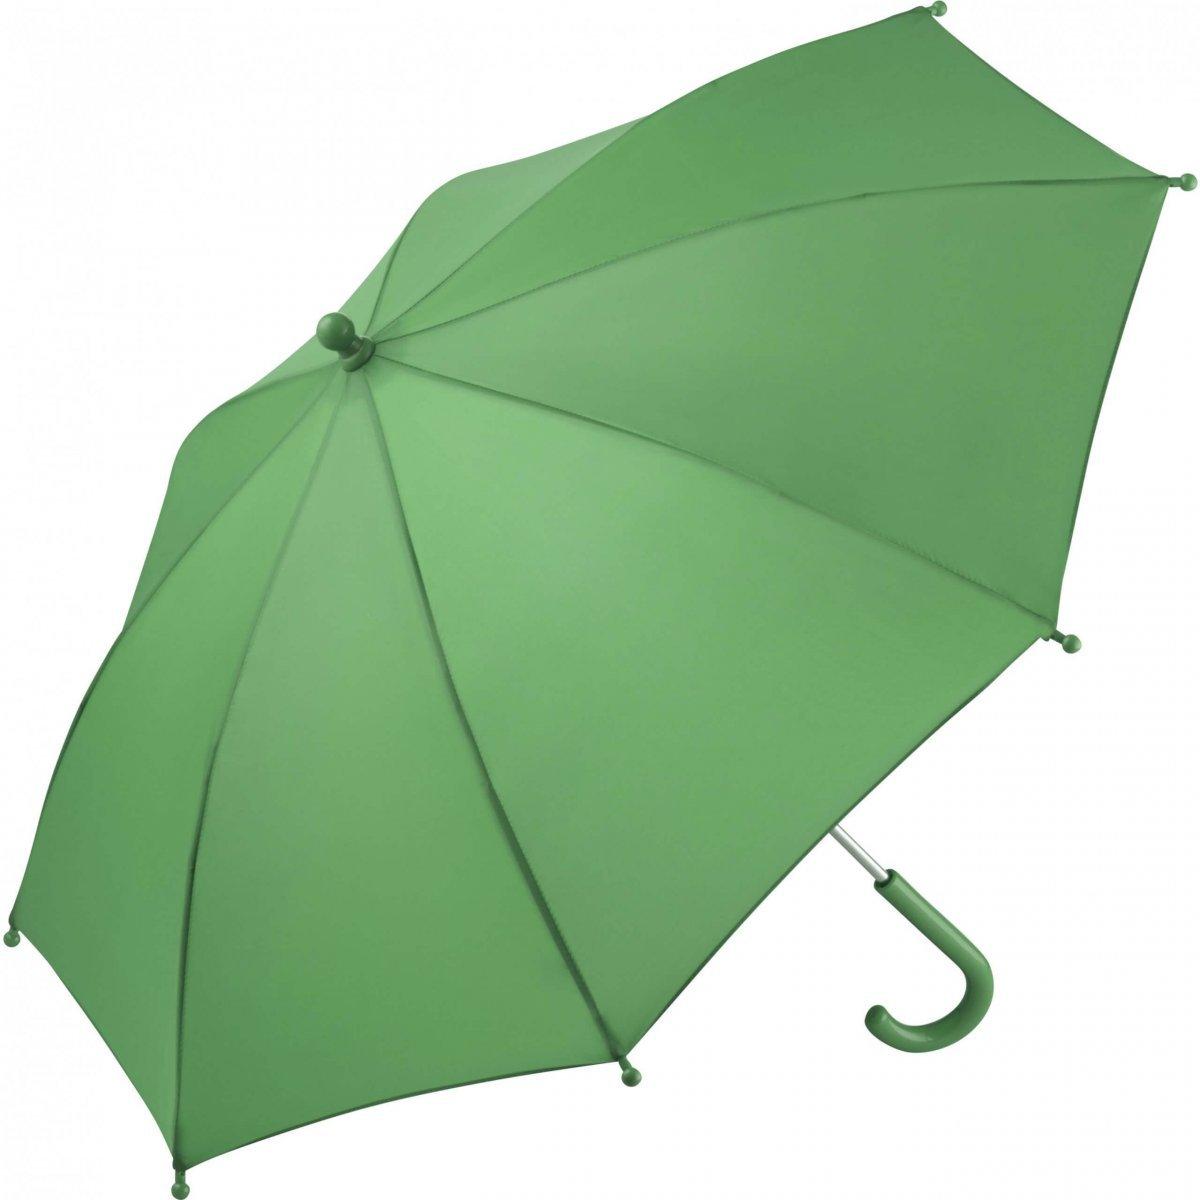 Sturdy Kids Umbrella